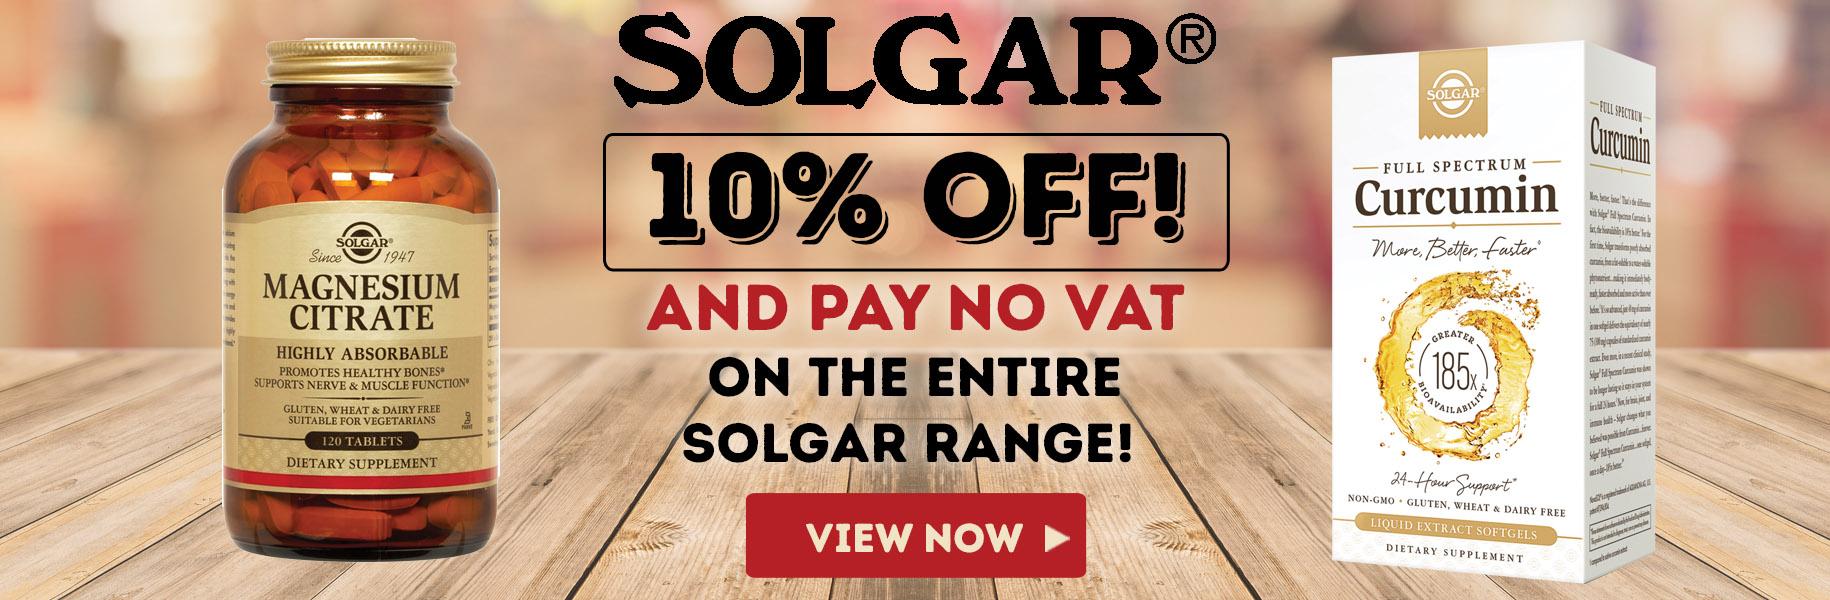 Solgar Sale